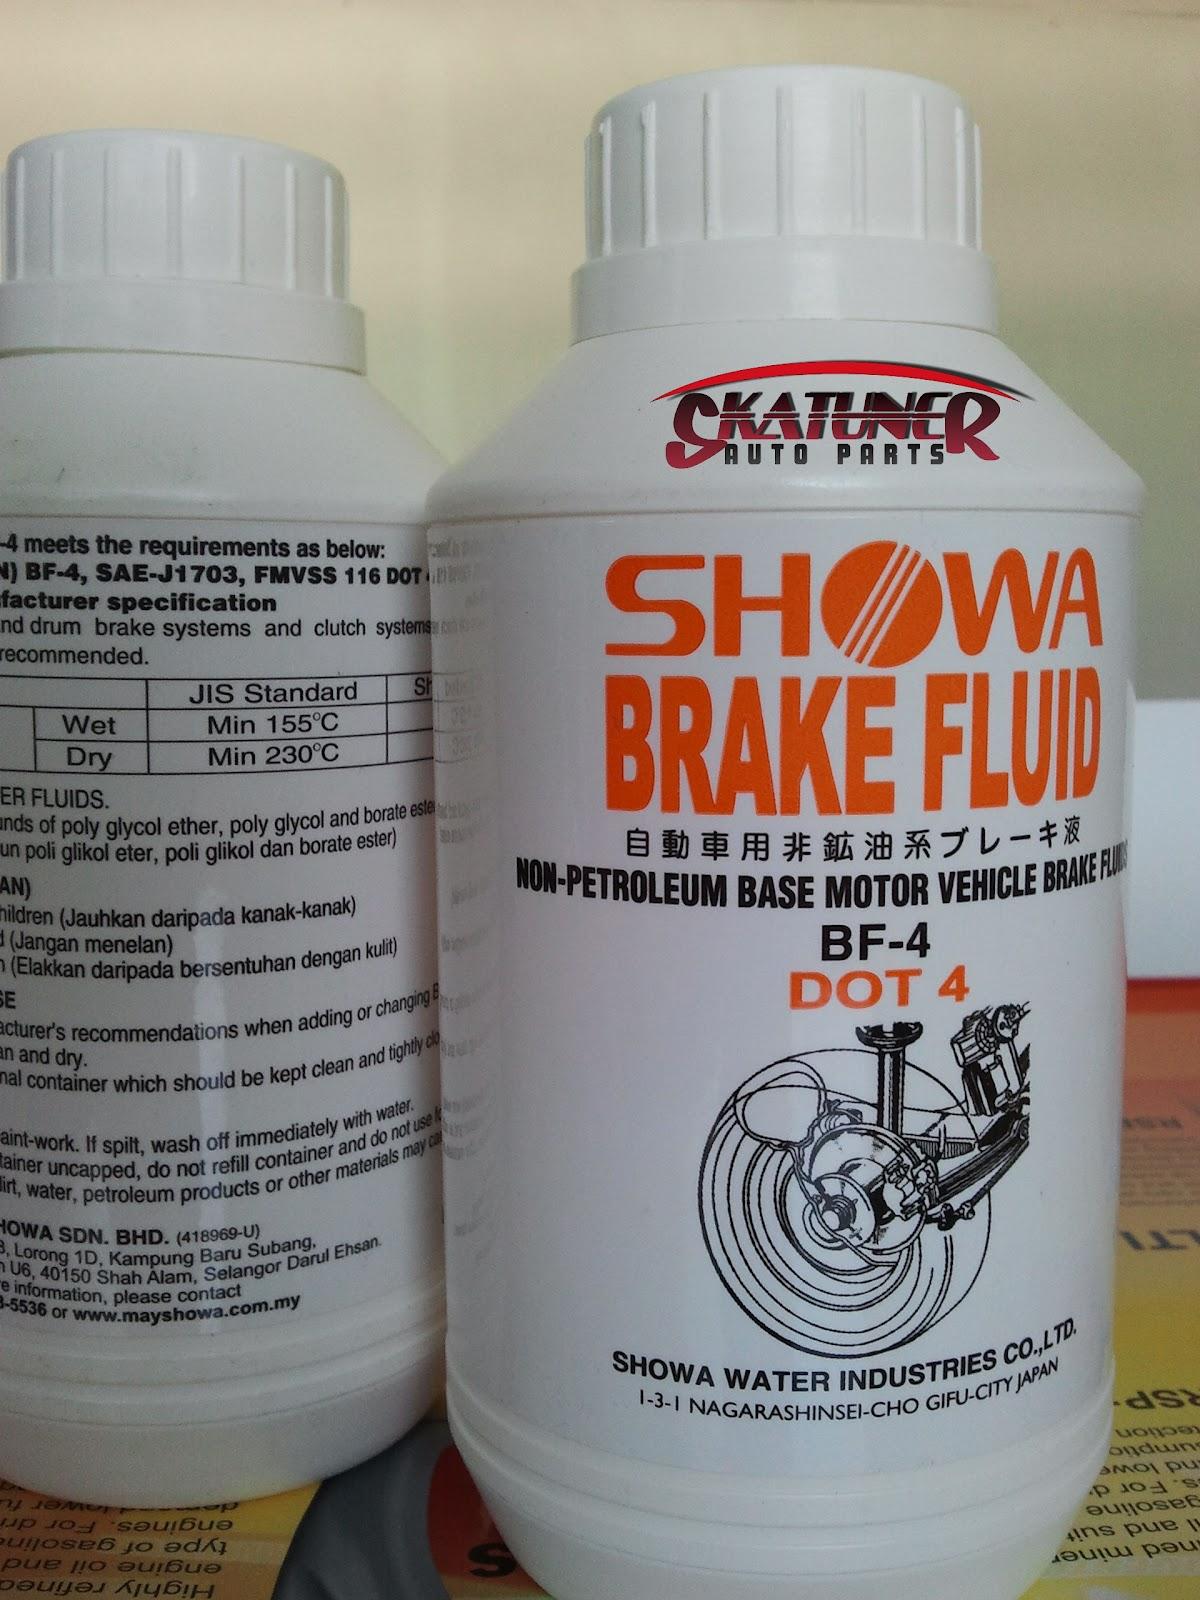 Skatuner Auto Parts: SHOWA DOT 4 BRAKE FLUID